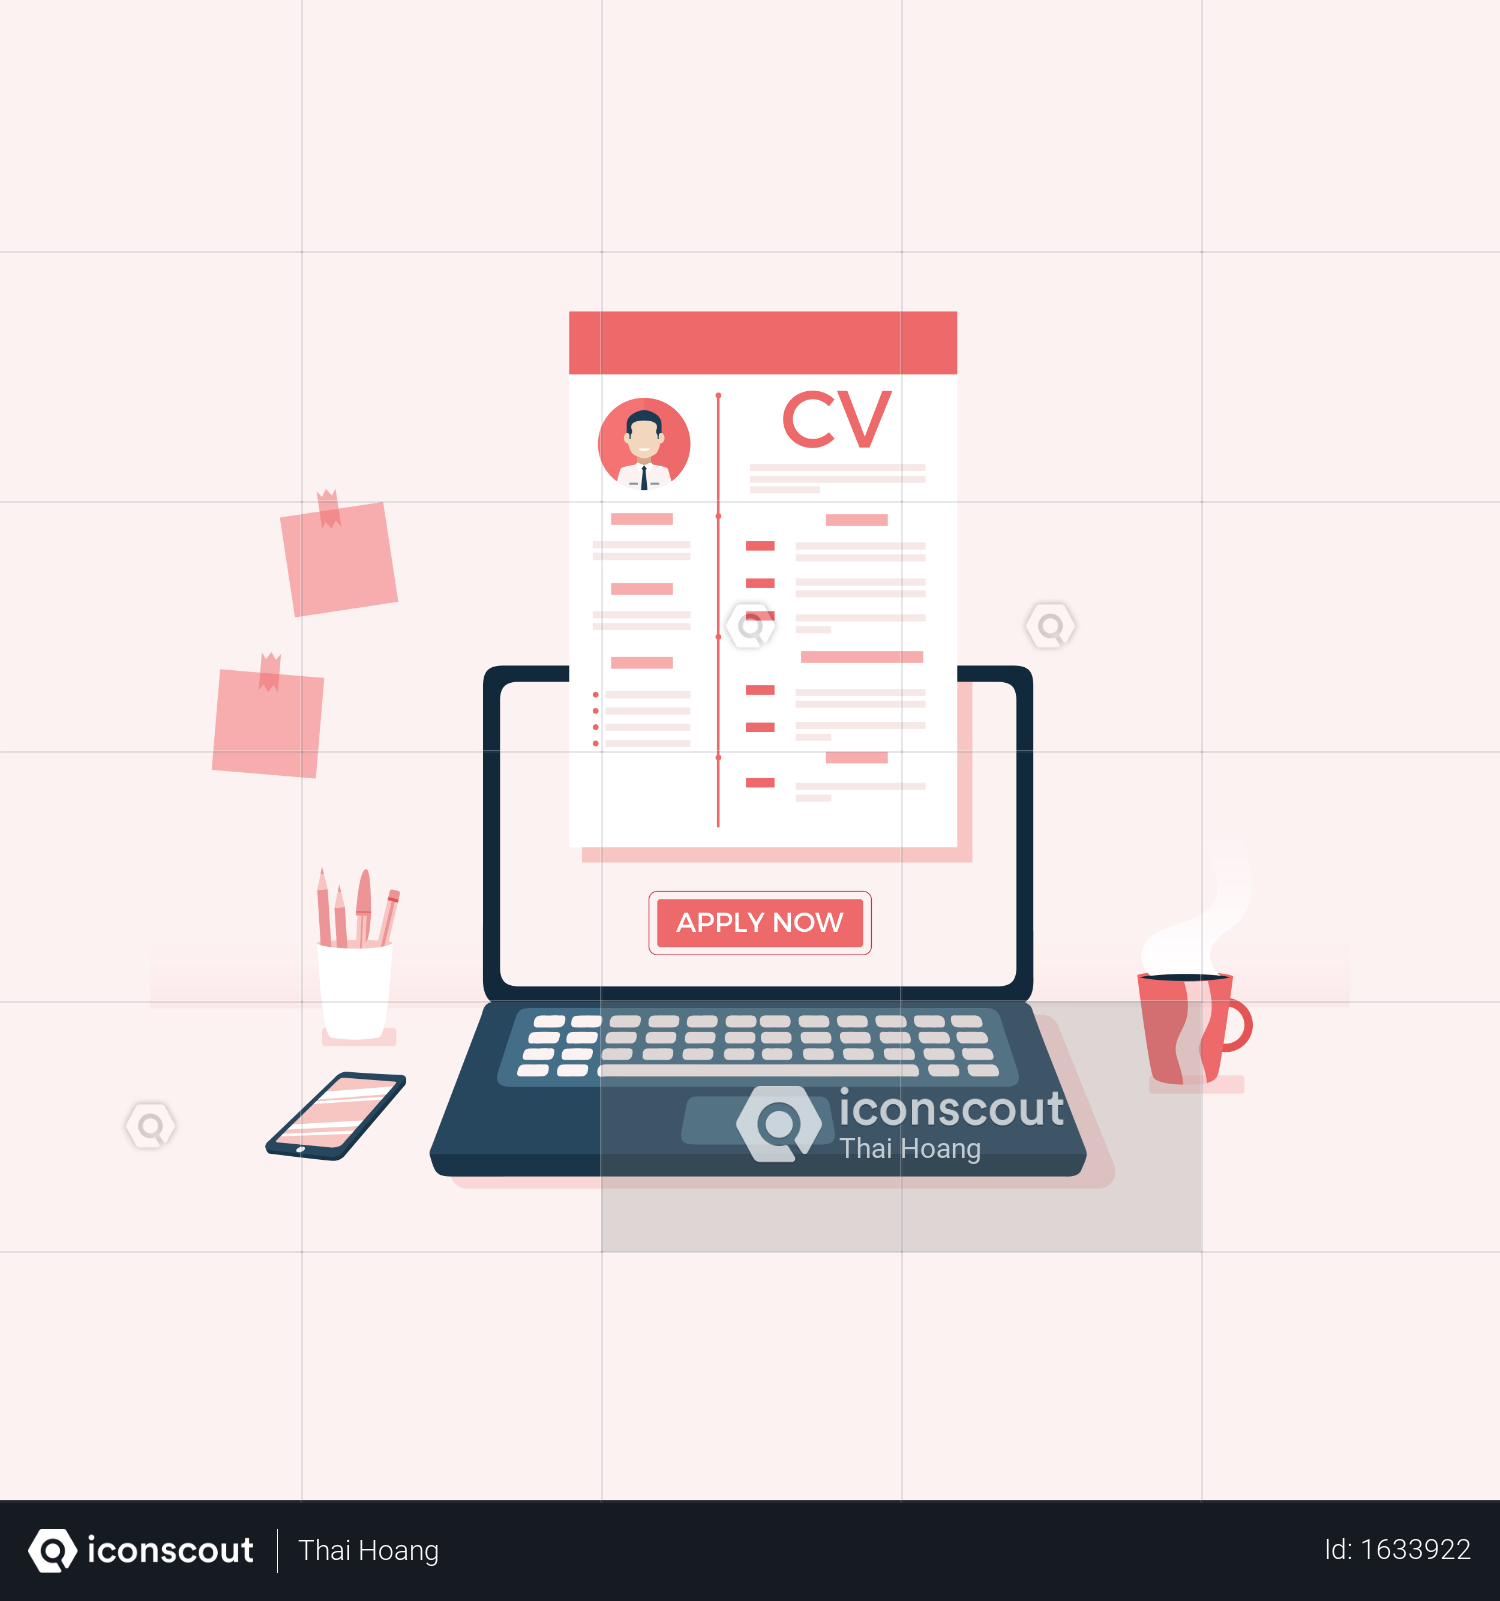 Premium Online Job Application Illustration Download In Png Vector Format Online Job Applications Job Application Online Jobs